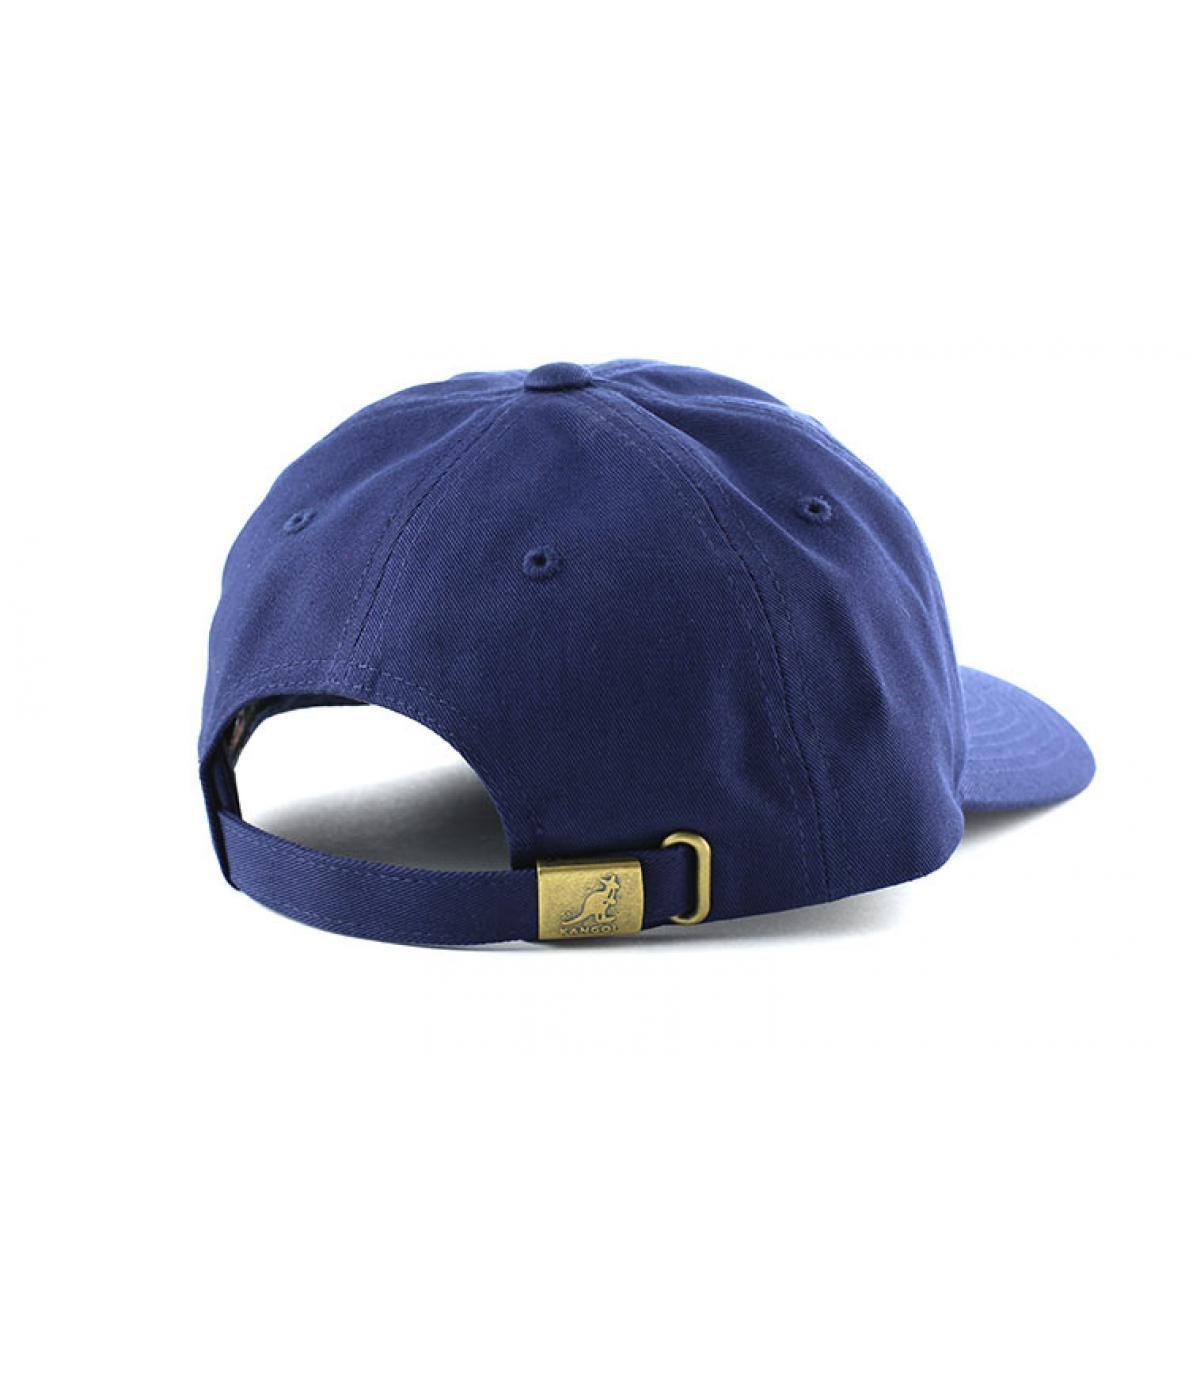 Détails Cotton adjustable baseball bleu marine - image 5